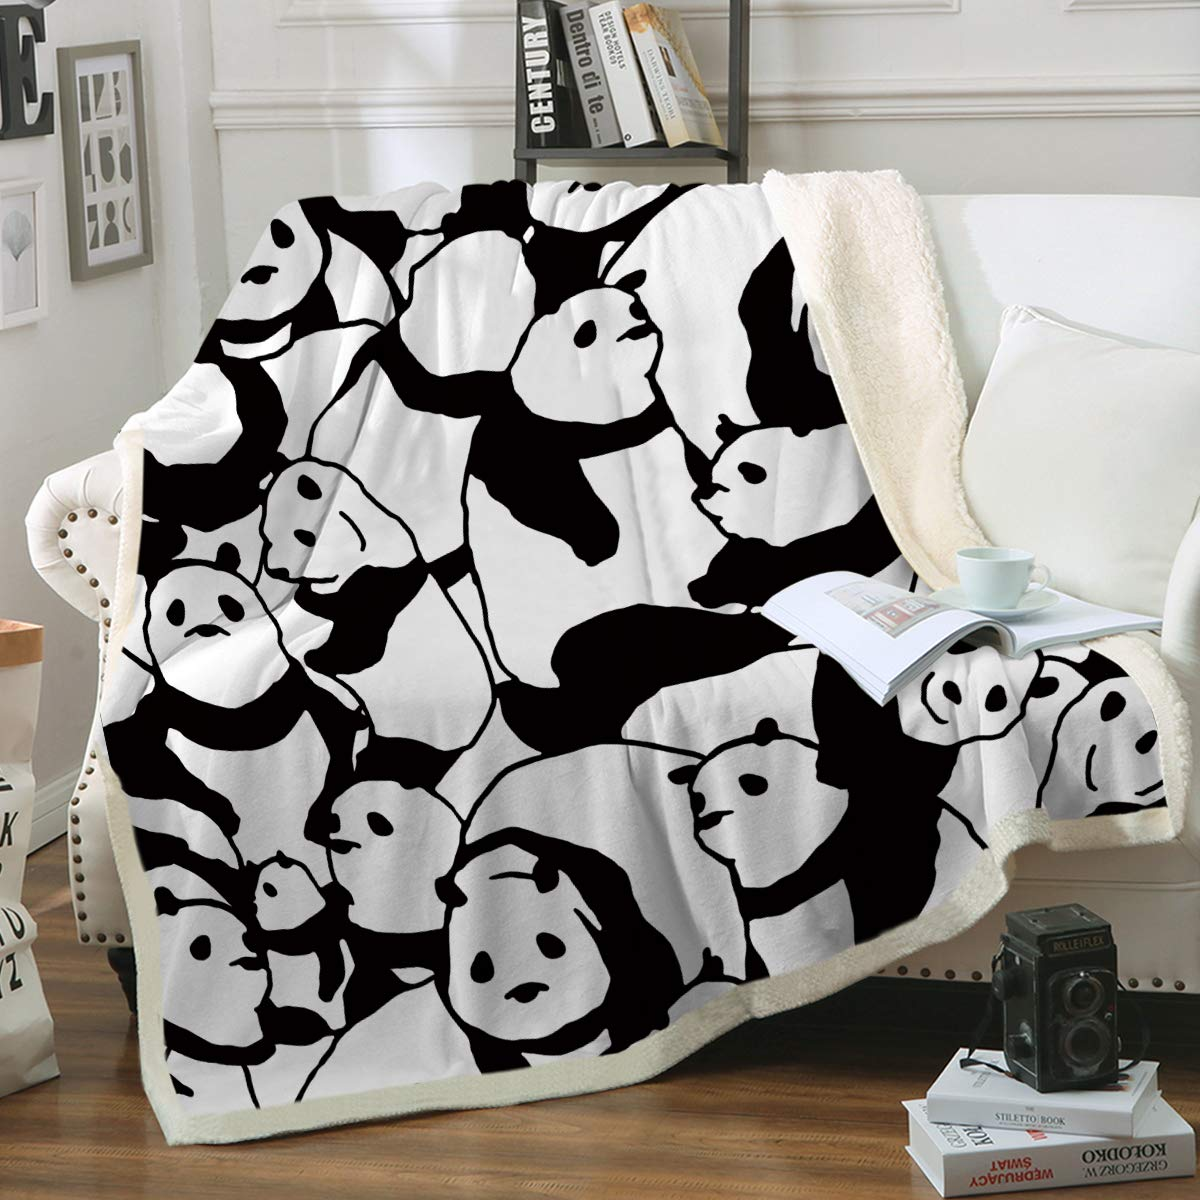 Sleepwish Panda Plush Blanket Cartoon Animal Throw Blanket Cute Panda Bears Graphic Pattern Kids Blankets Fleece Soft Warm Fuzzy Blankets for Teens (50x60 Inches) by Sleepwish